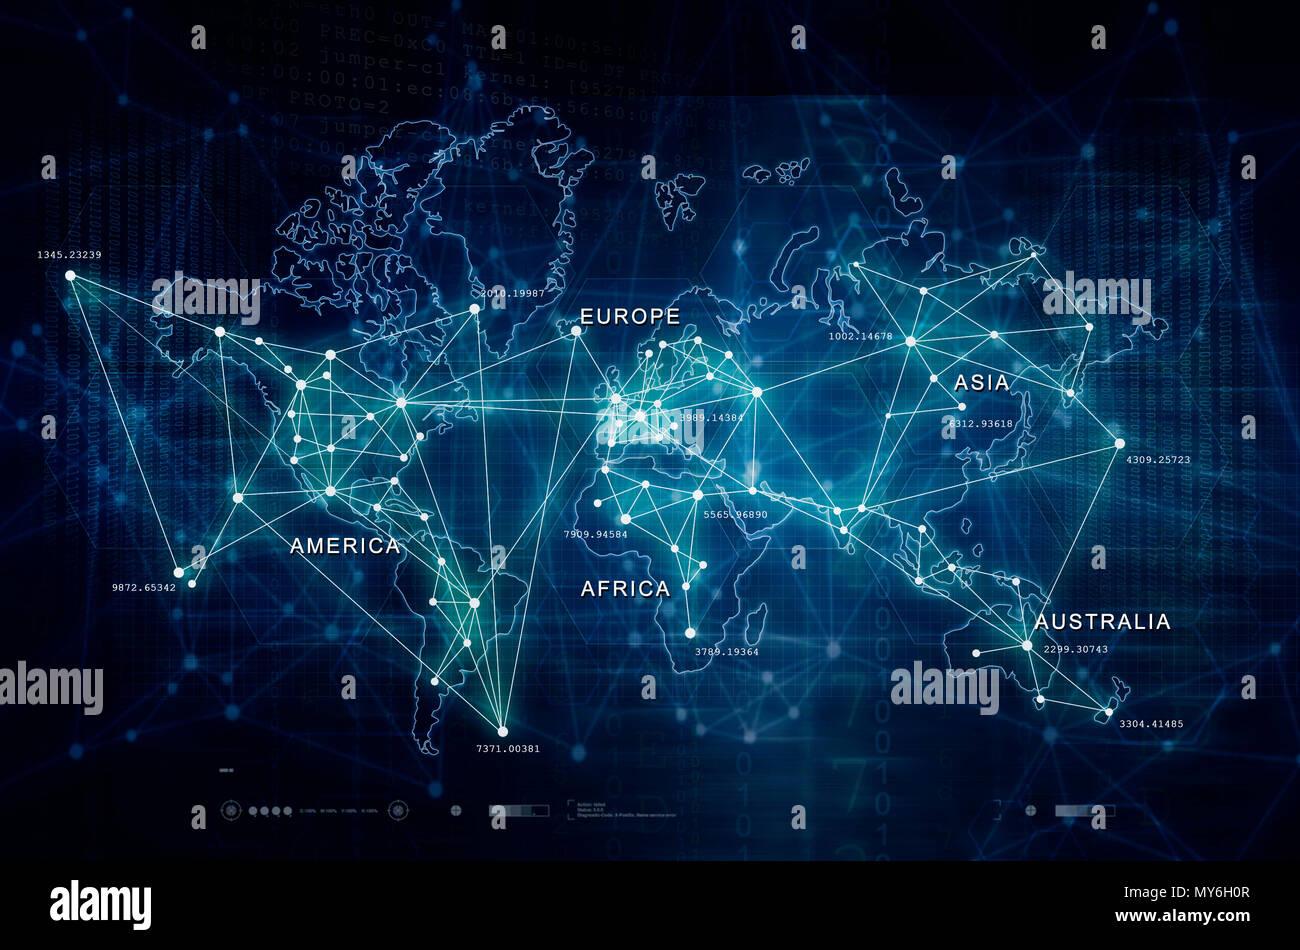 Internet Of Things Digital World Map Stock Photo 188844455 Alamy